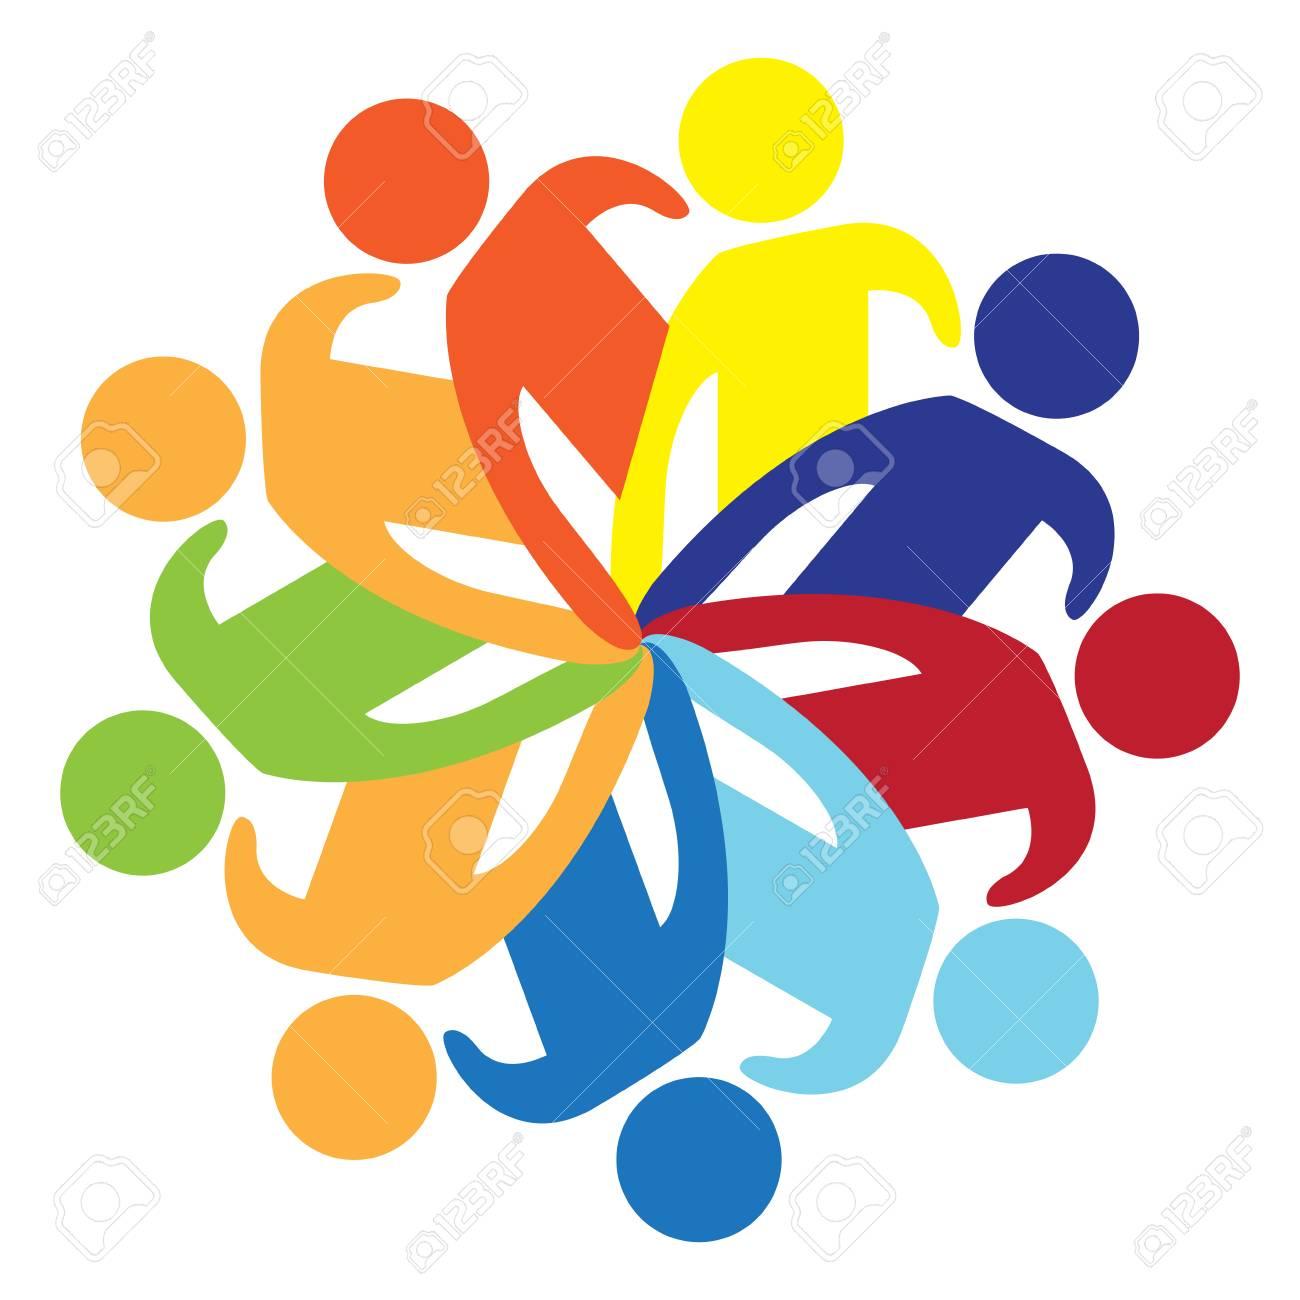 Isolated teamwork icon image. Vector illustration design - 124889726